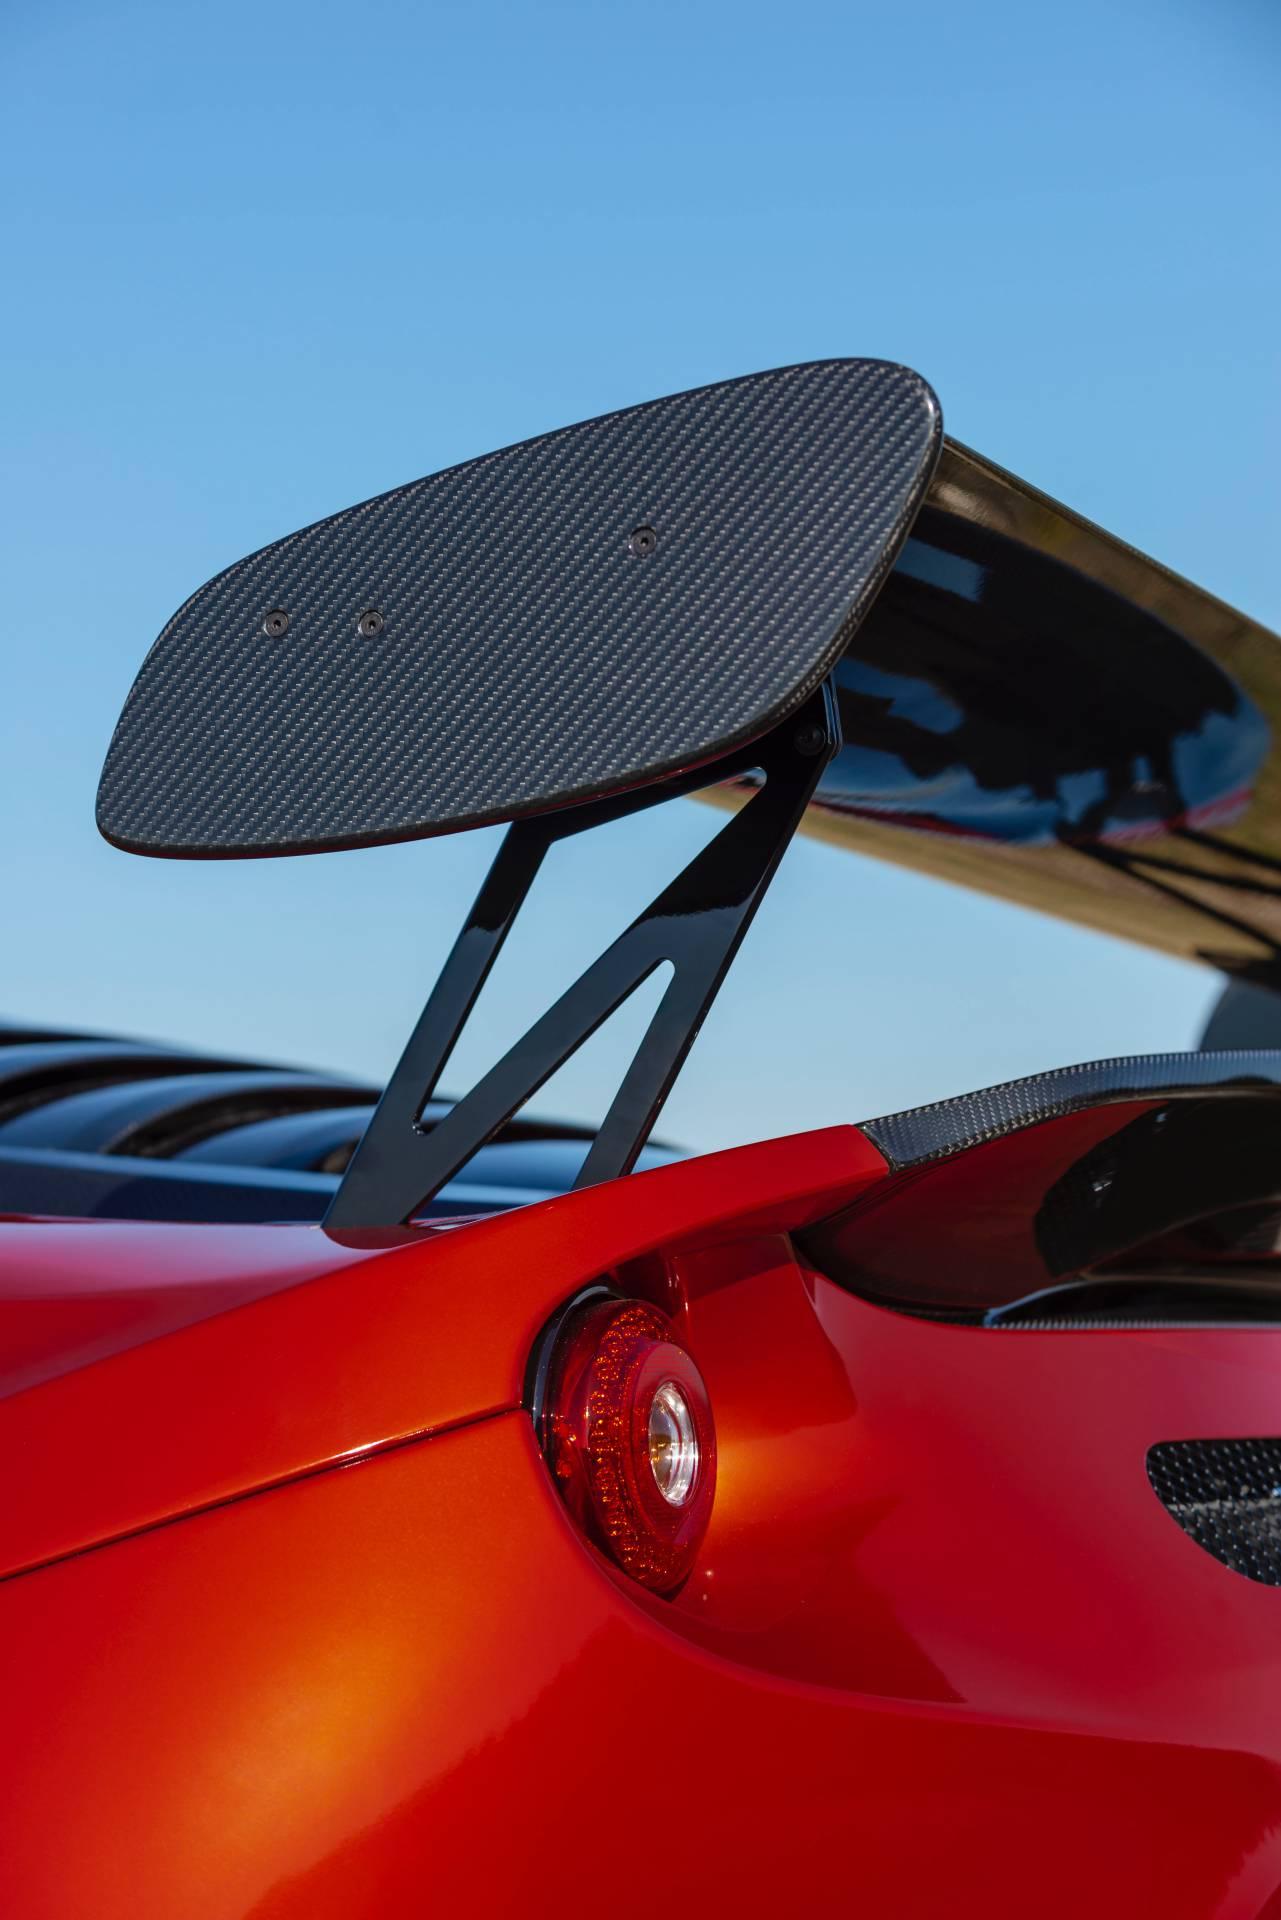 Lotus-Evora-GT4-Concept-16